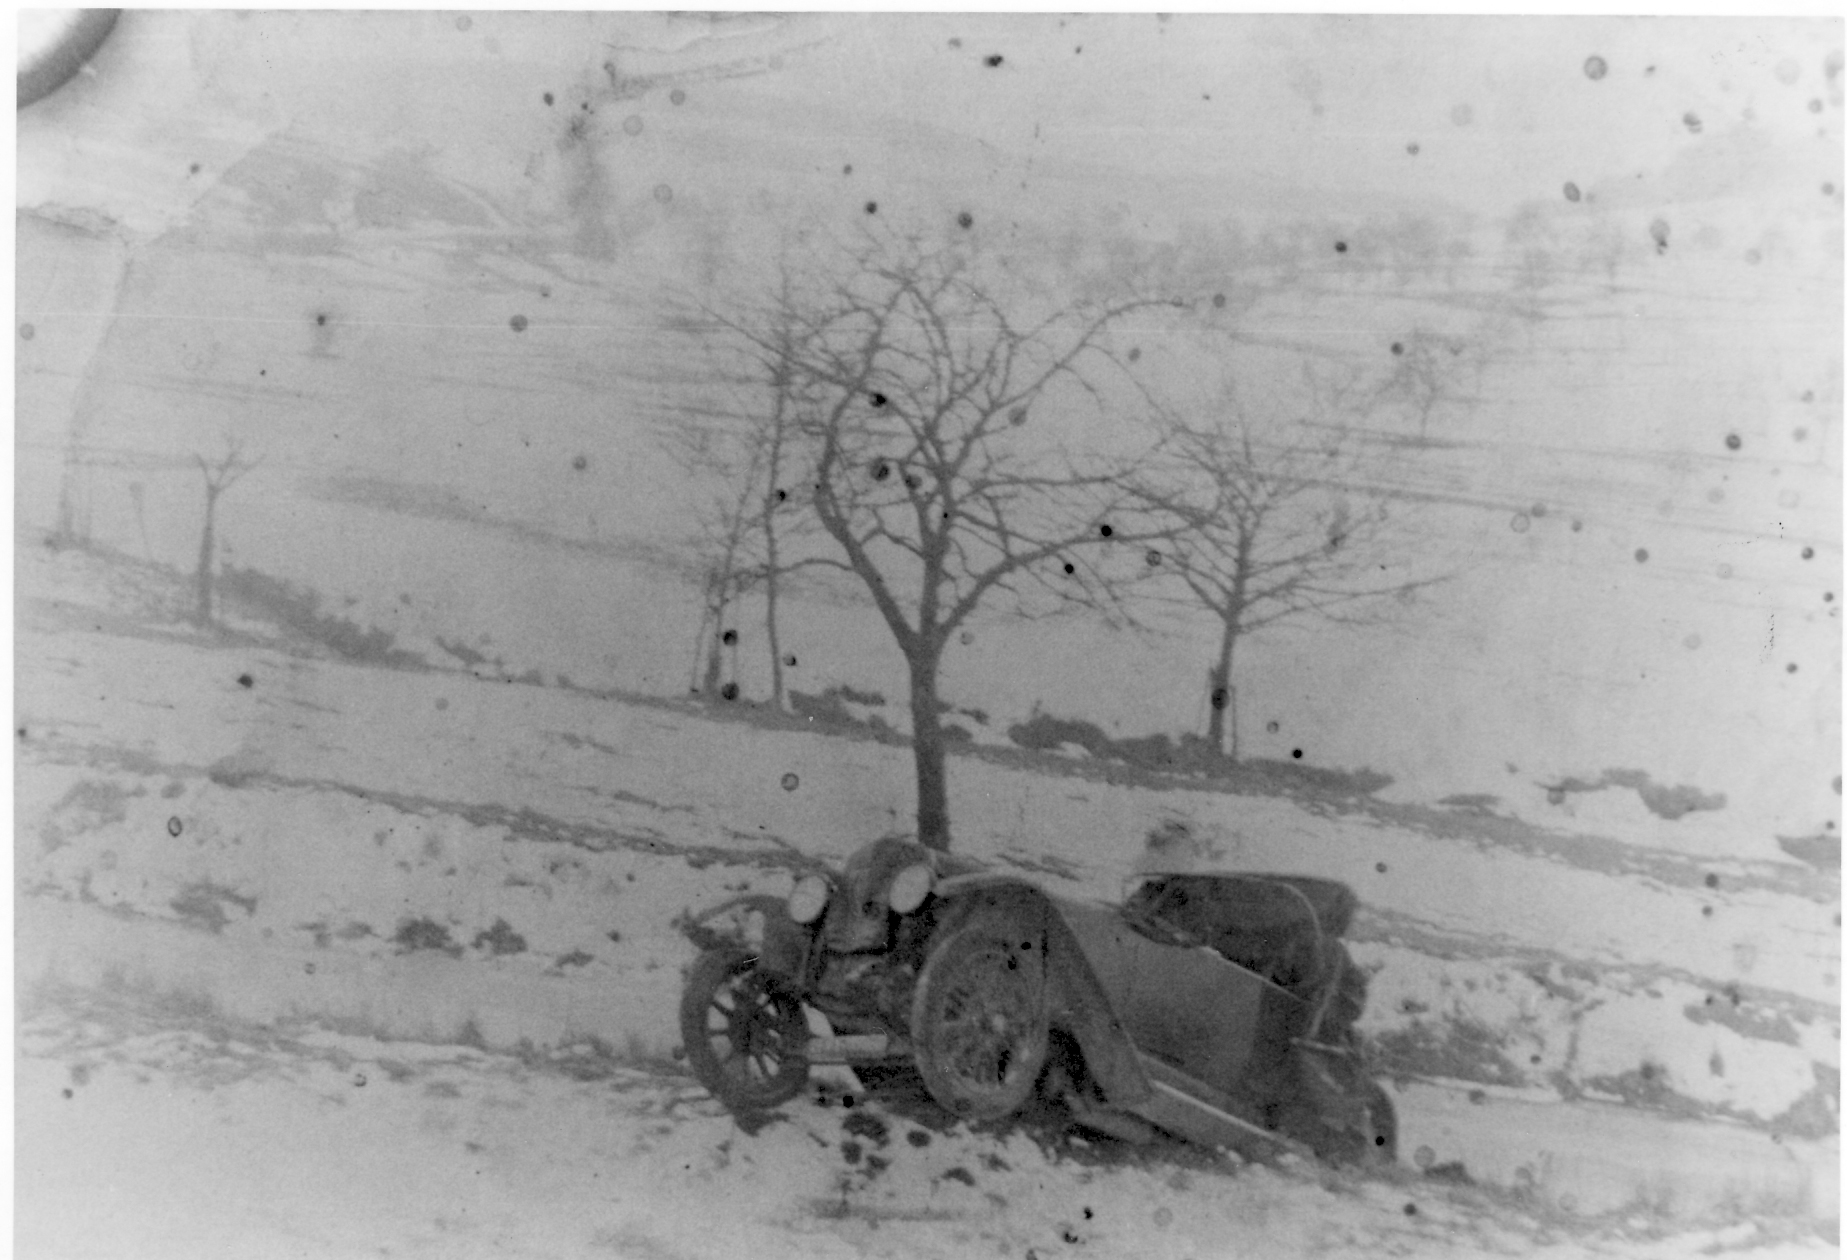 Autounfall im Winter